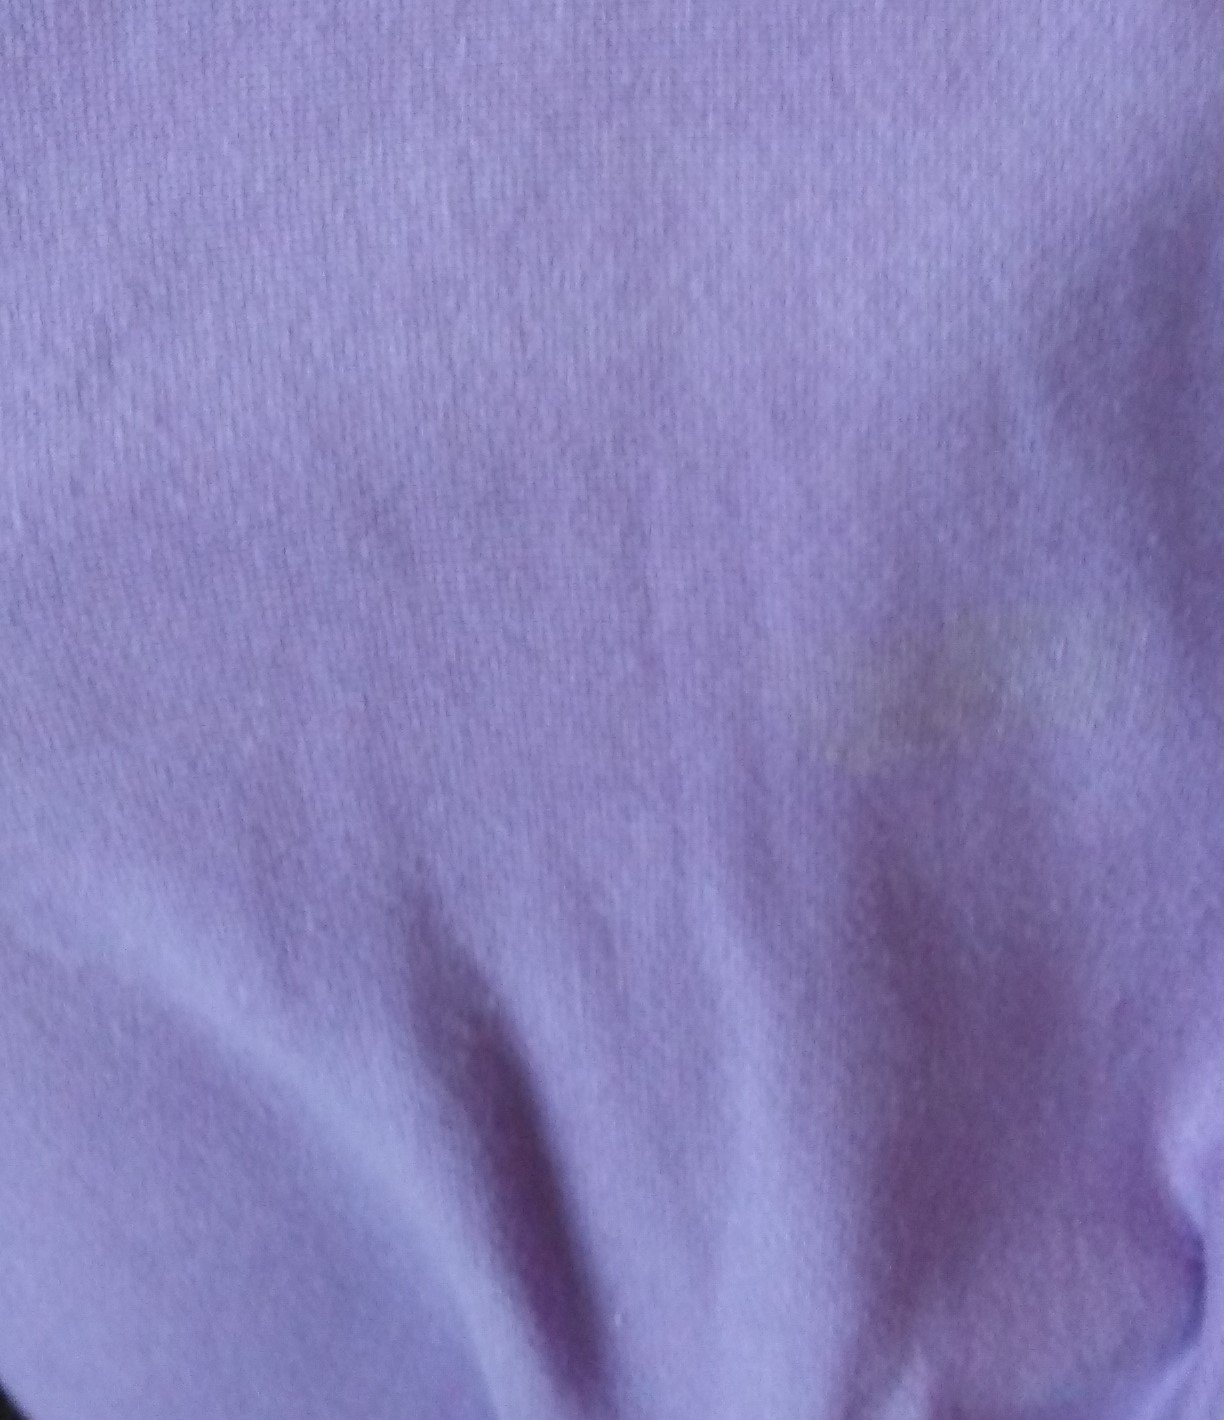 SLTX COTTON SWEATSHIRT FLEECE ORCHID